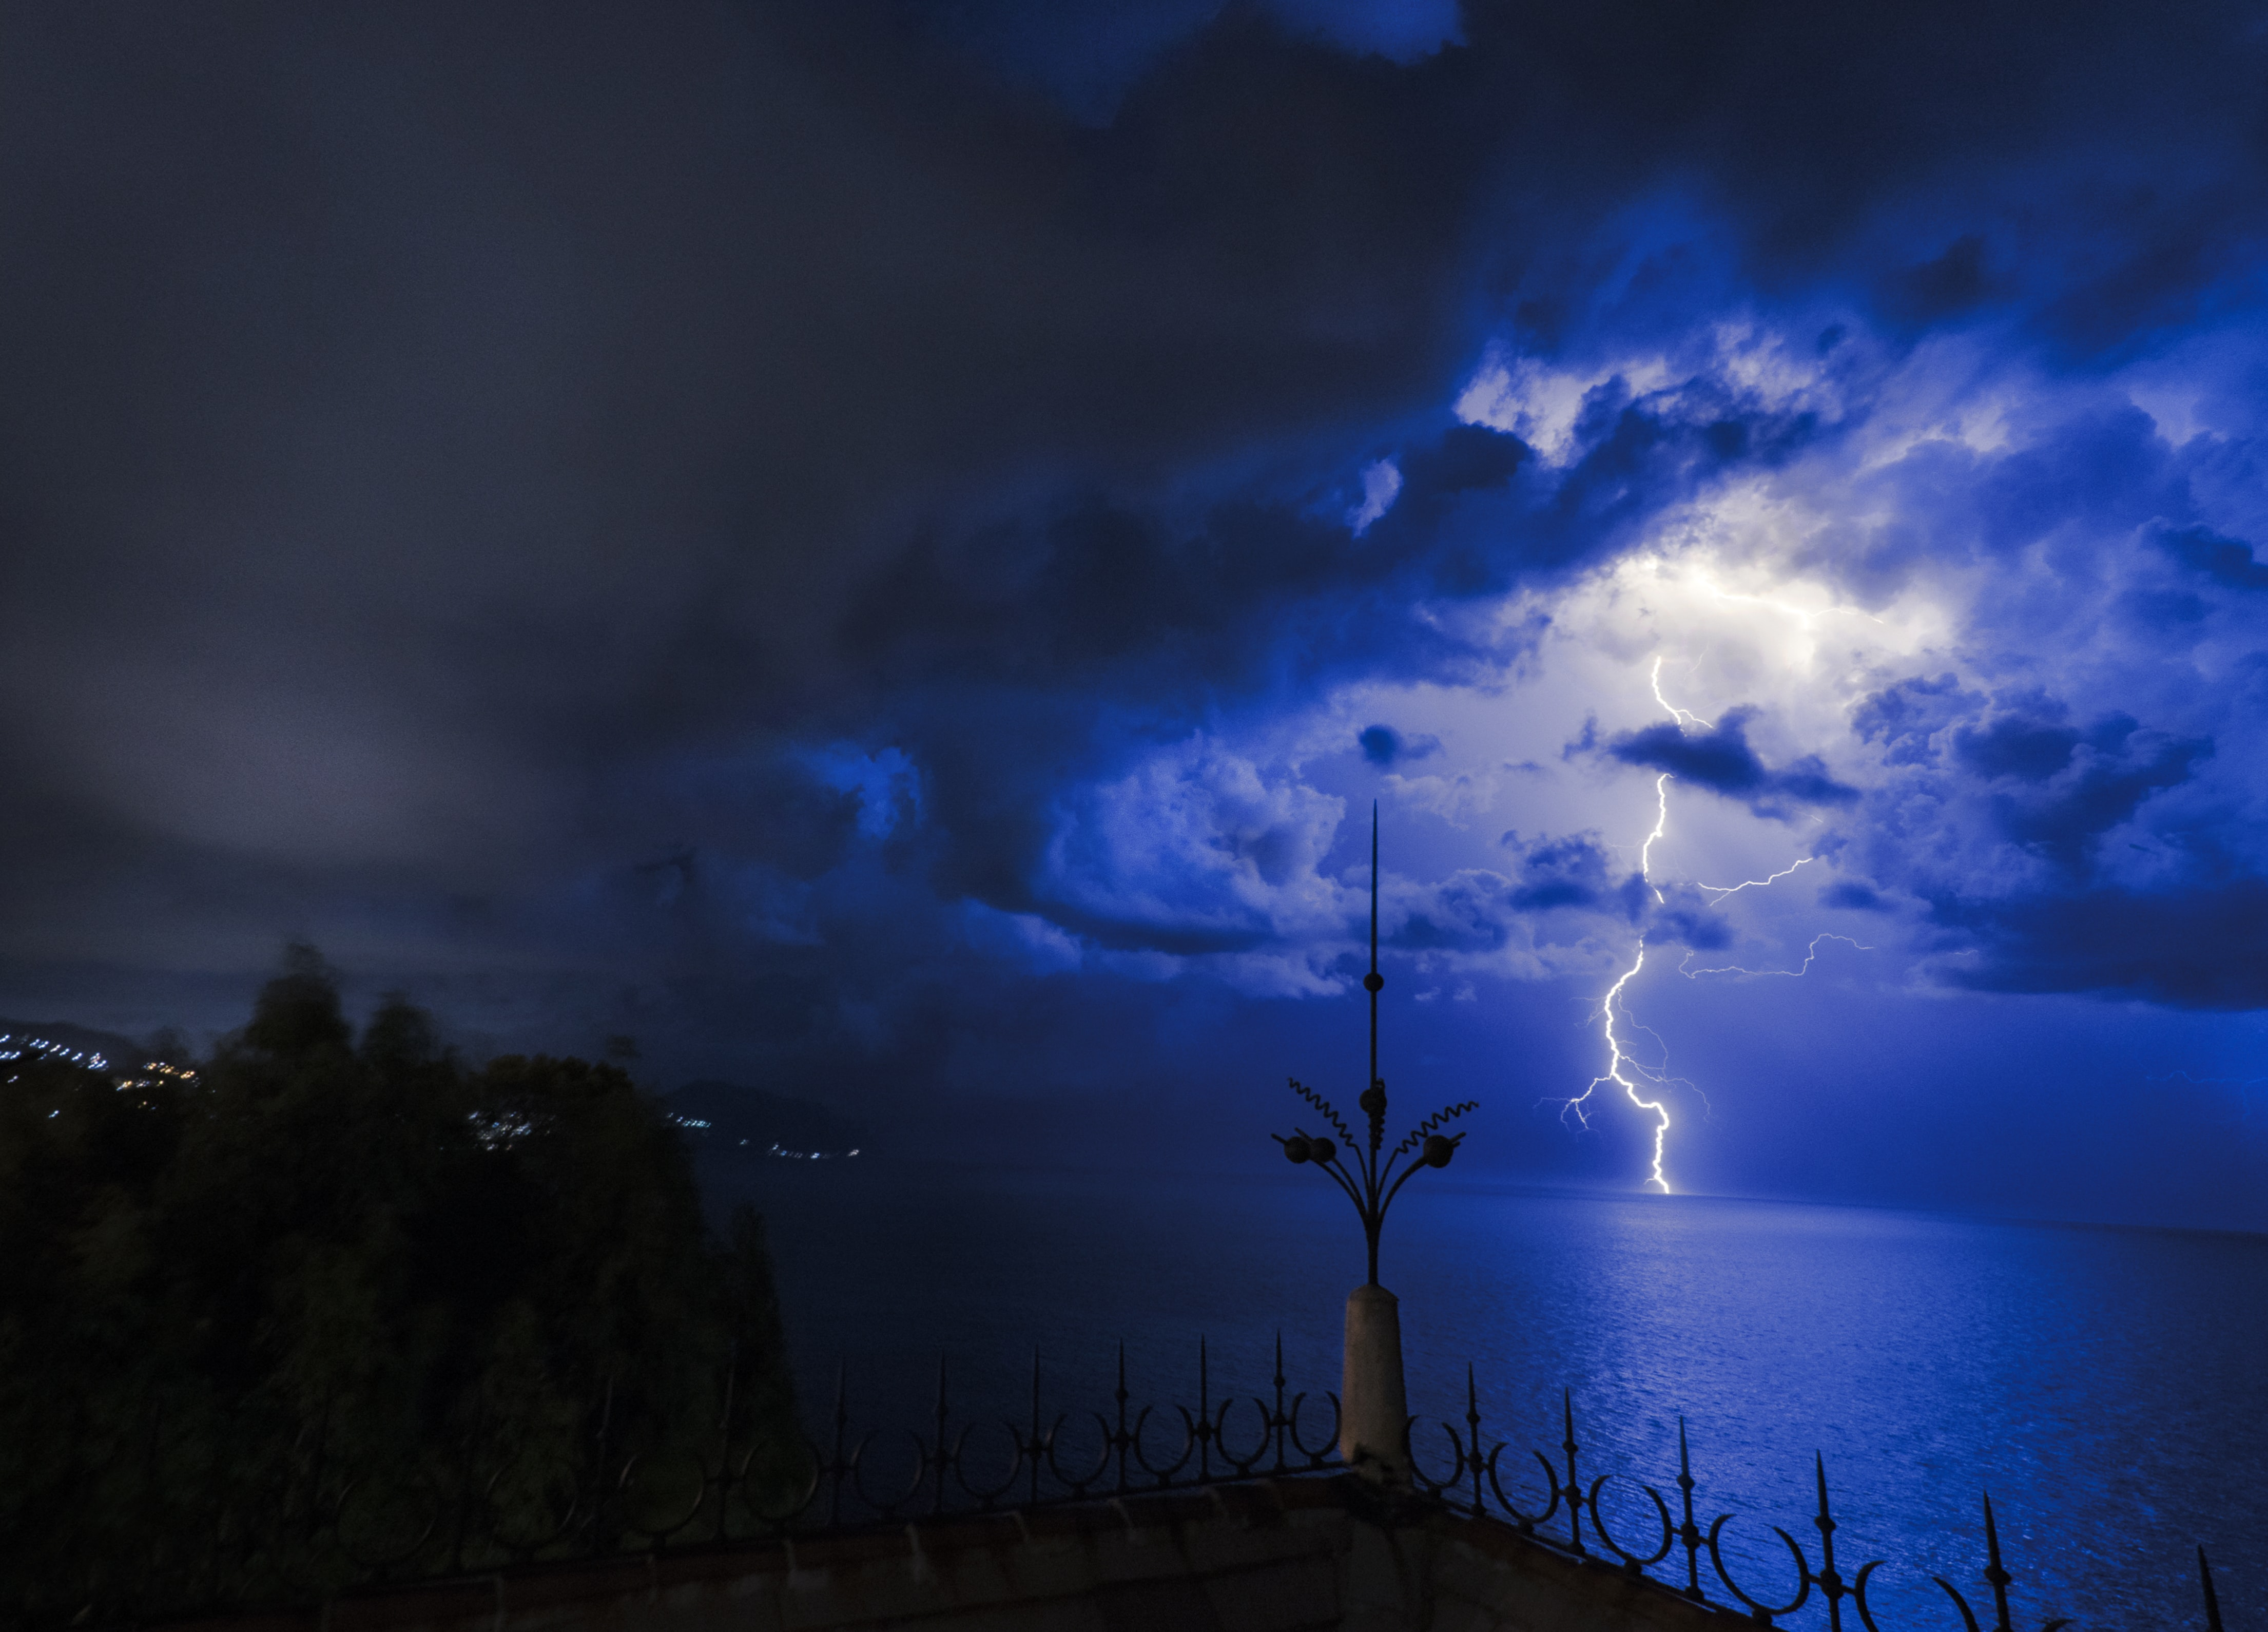 lightning hit on the sea during night